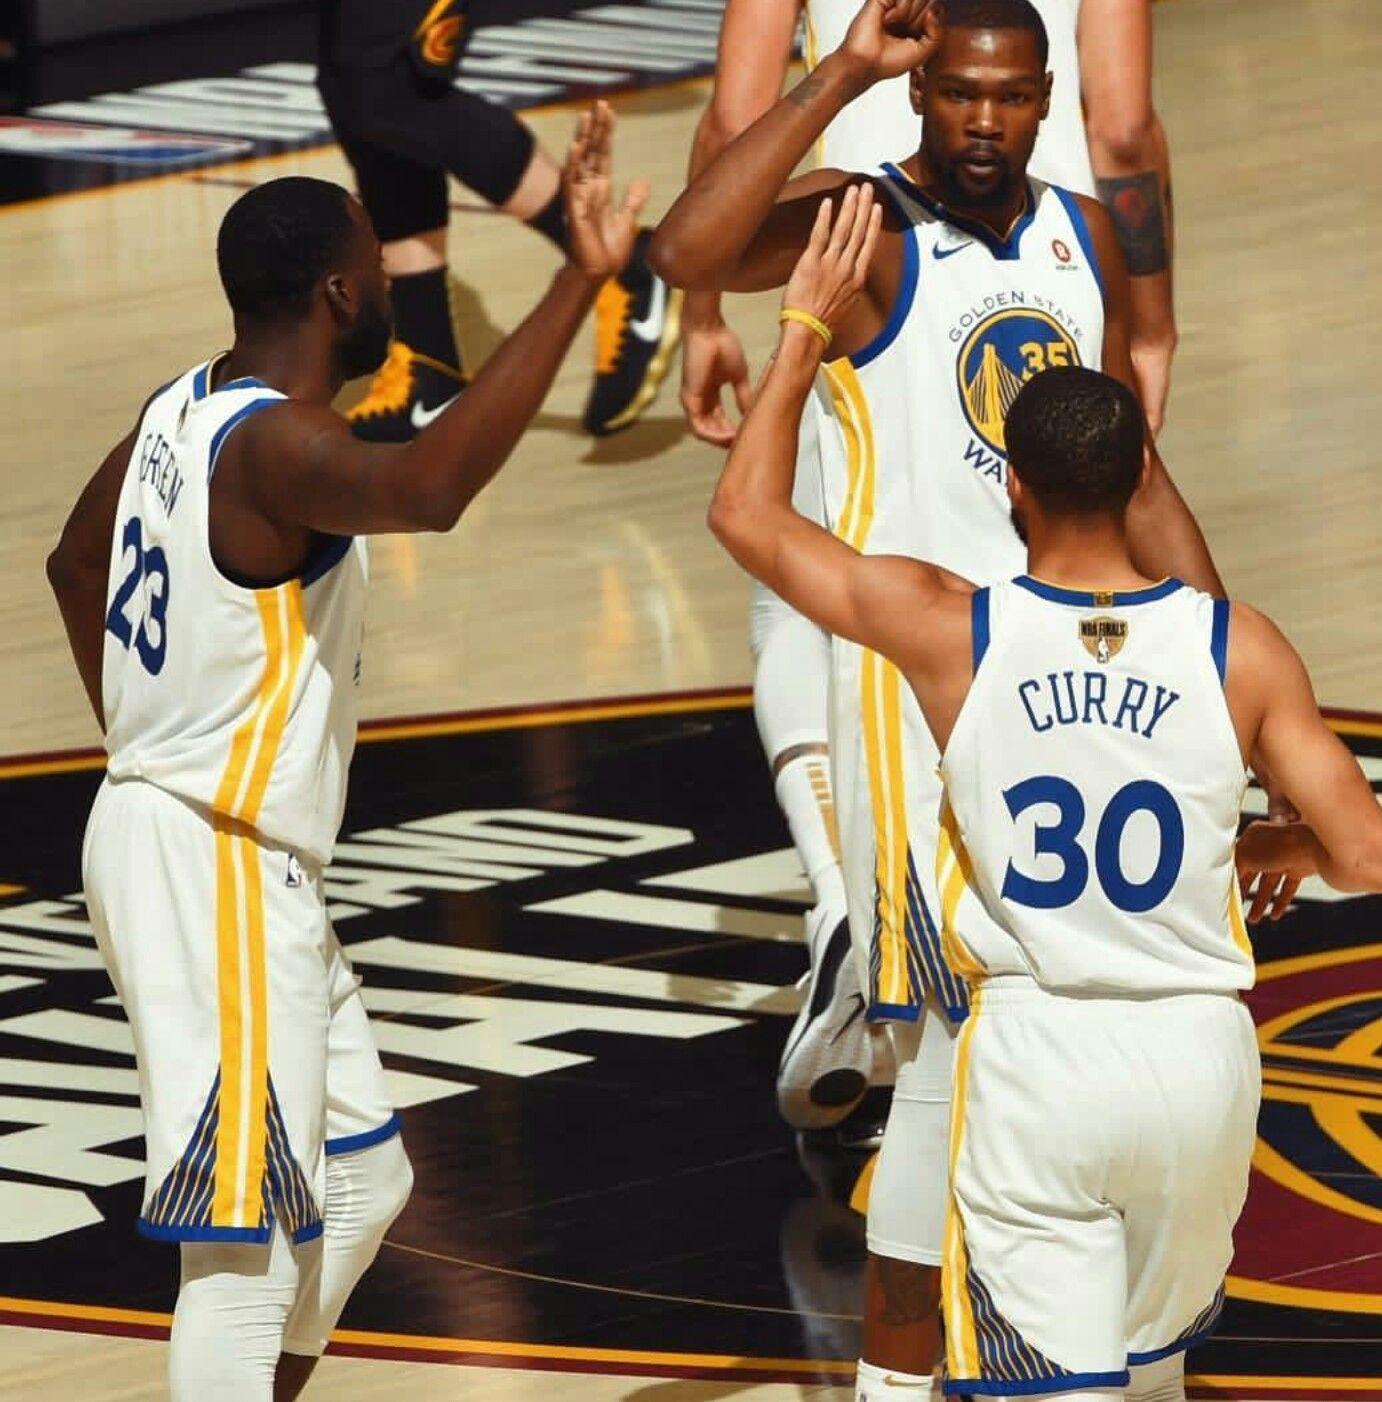 Pin by enticing on NBA IT'S FAN.... U KNO Nba champions